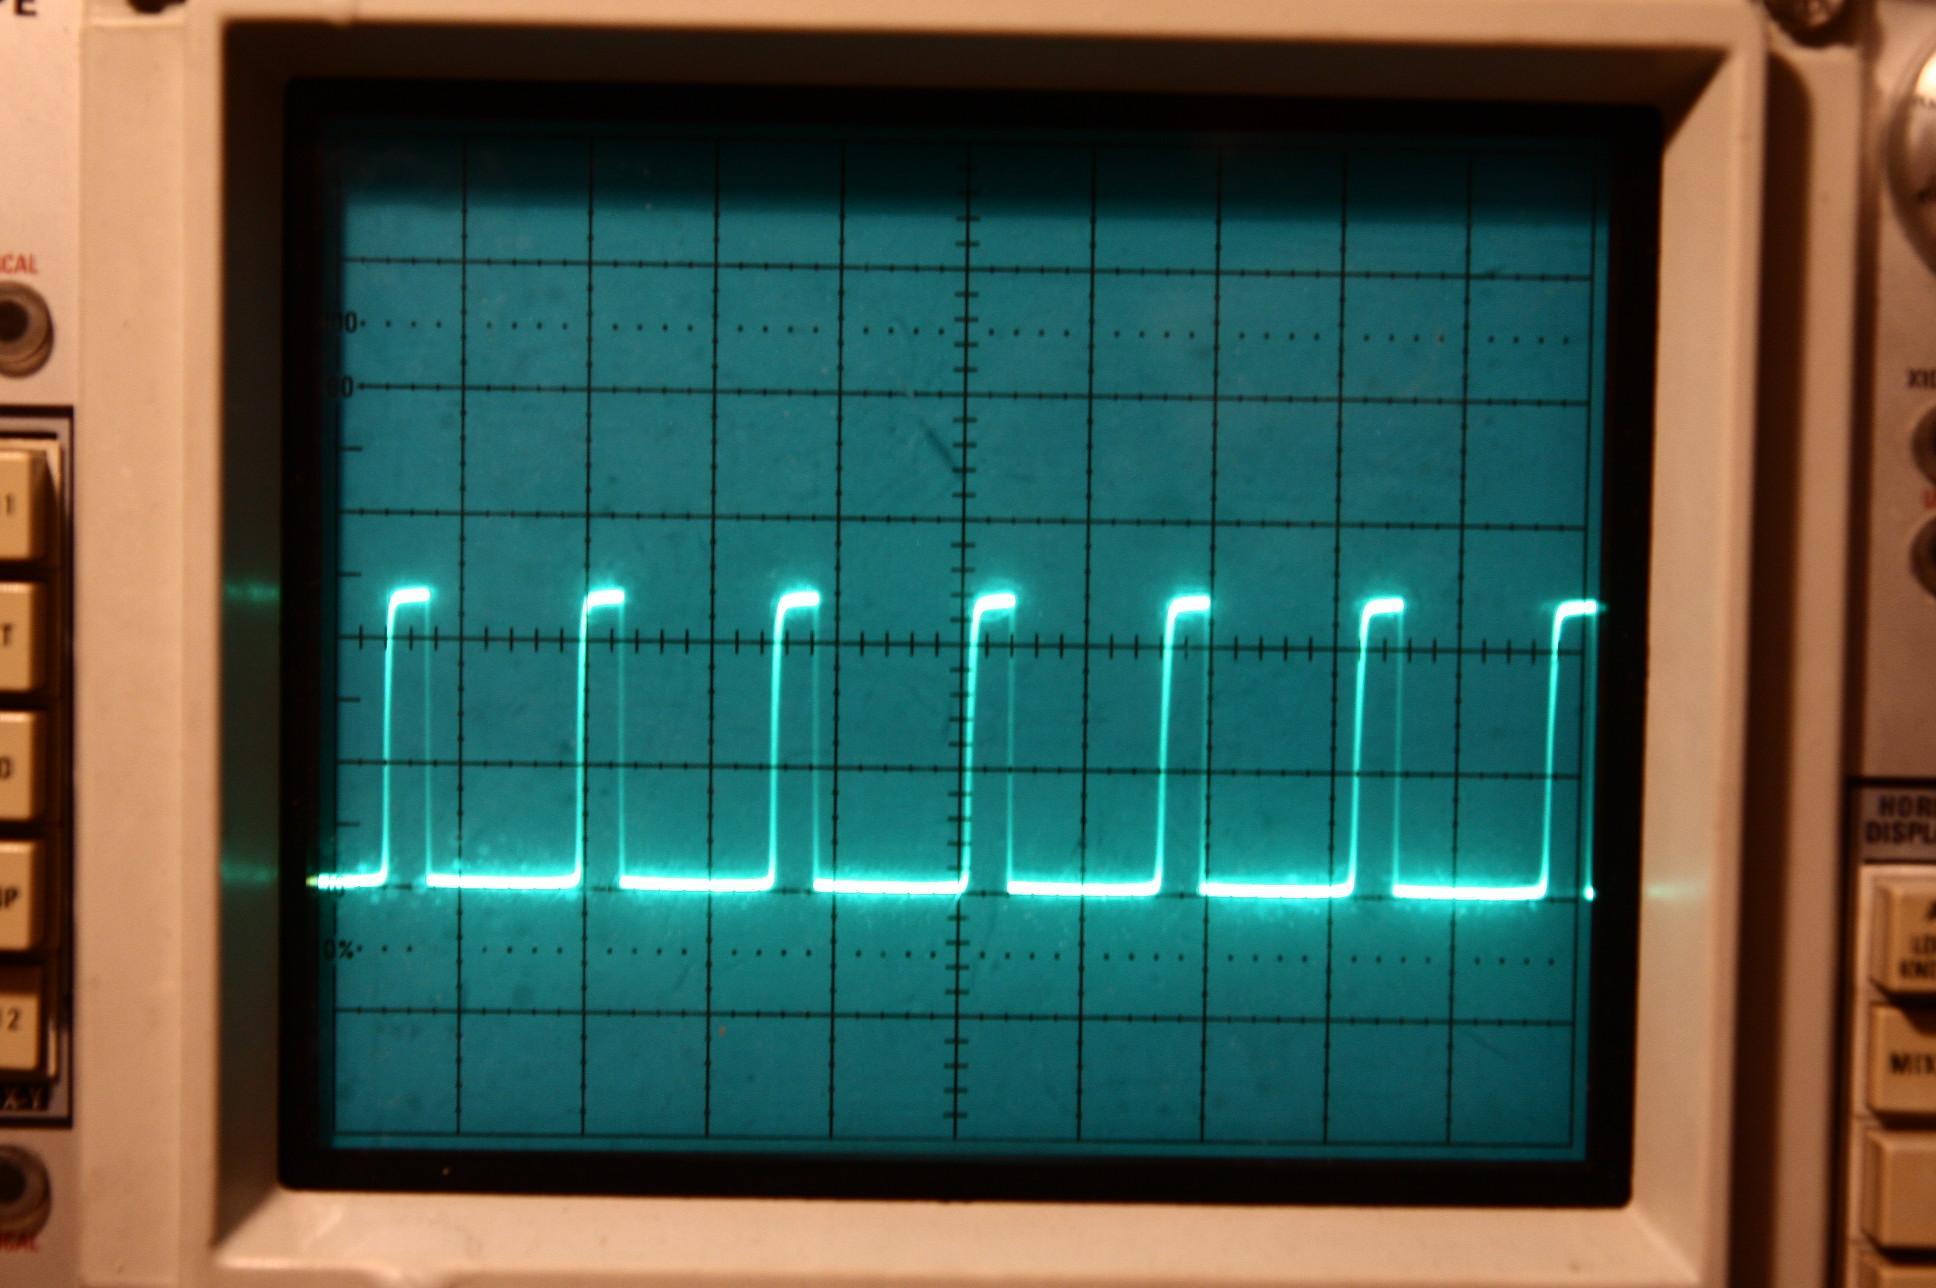 transistor schaltet ab 200khz nicht richtig. Black Bedroom Furniture Sets. Home Design Ideas